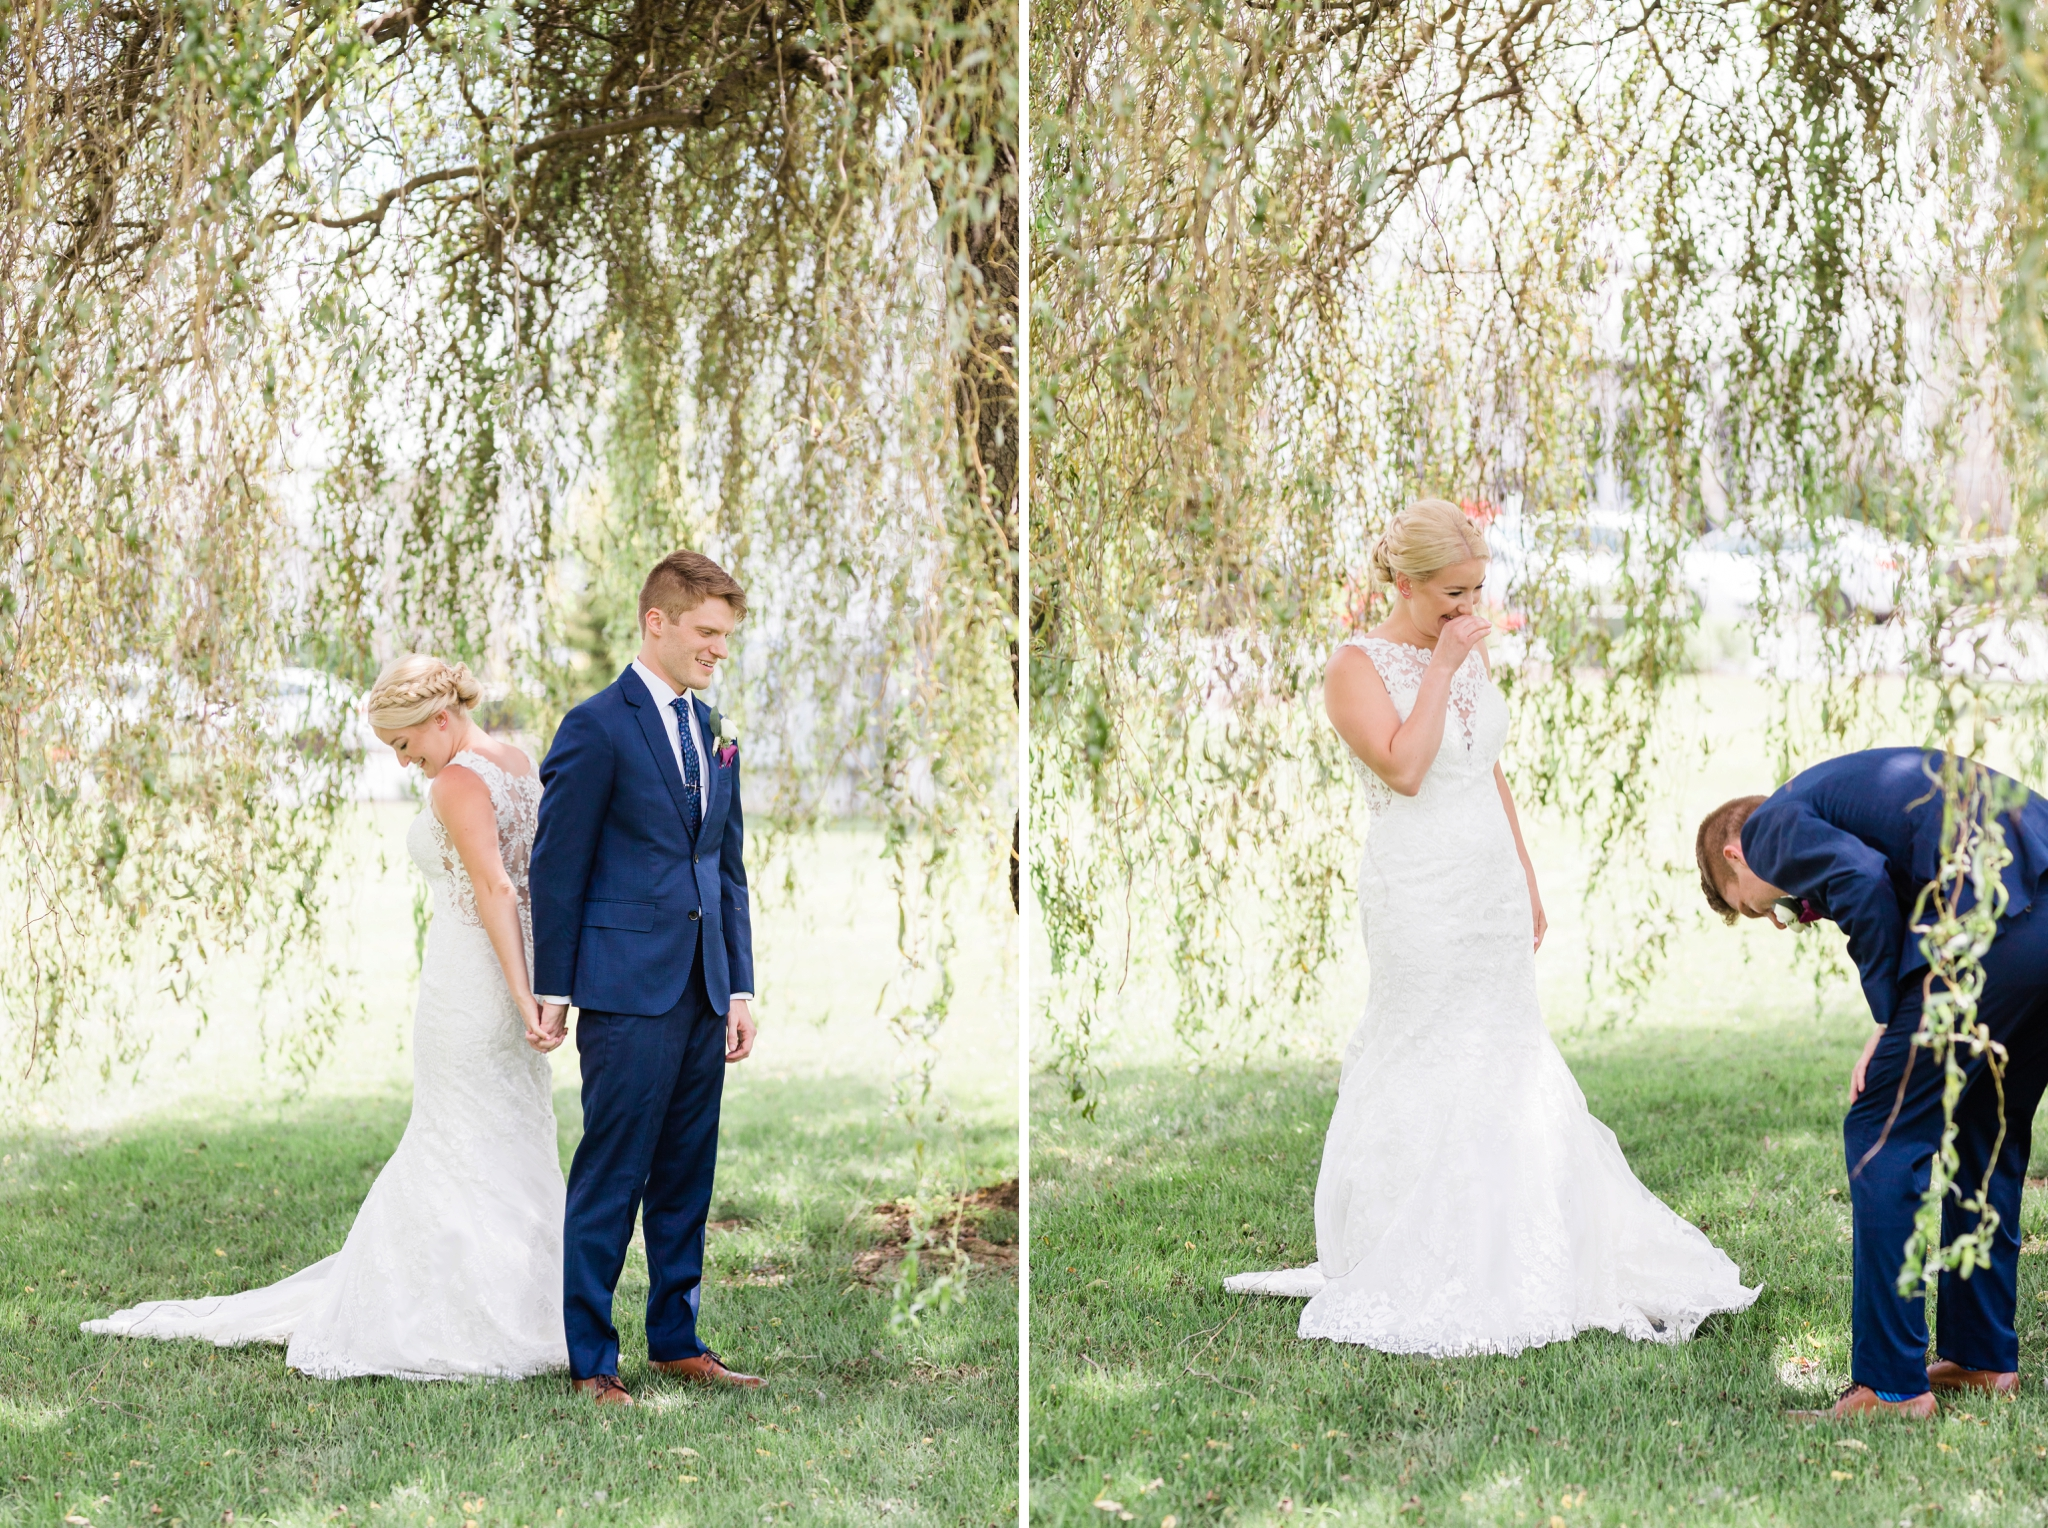 Emily Grace Photography, Lancaster PA Wedding Photographer, Wedding Photography for Unique Couples, The Barn at Silverstone, Lancaster PA Wedding Venue, The Barn at Silverstone First Look